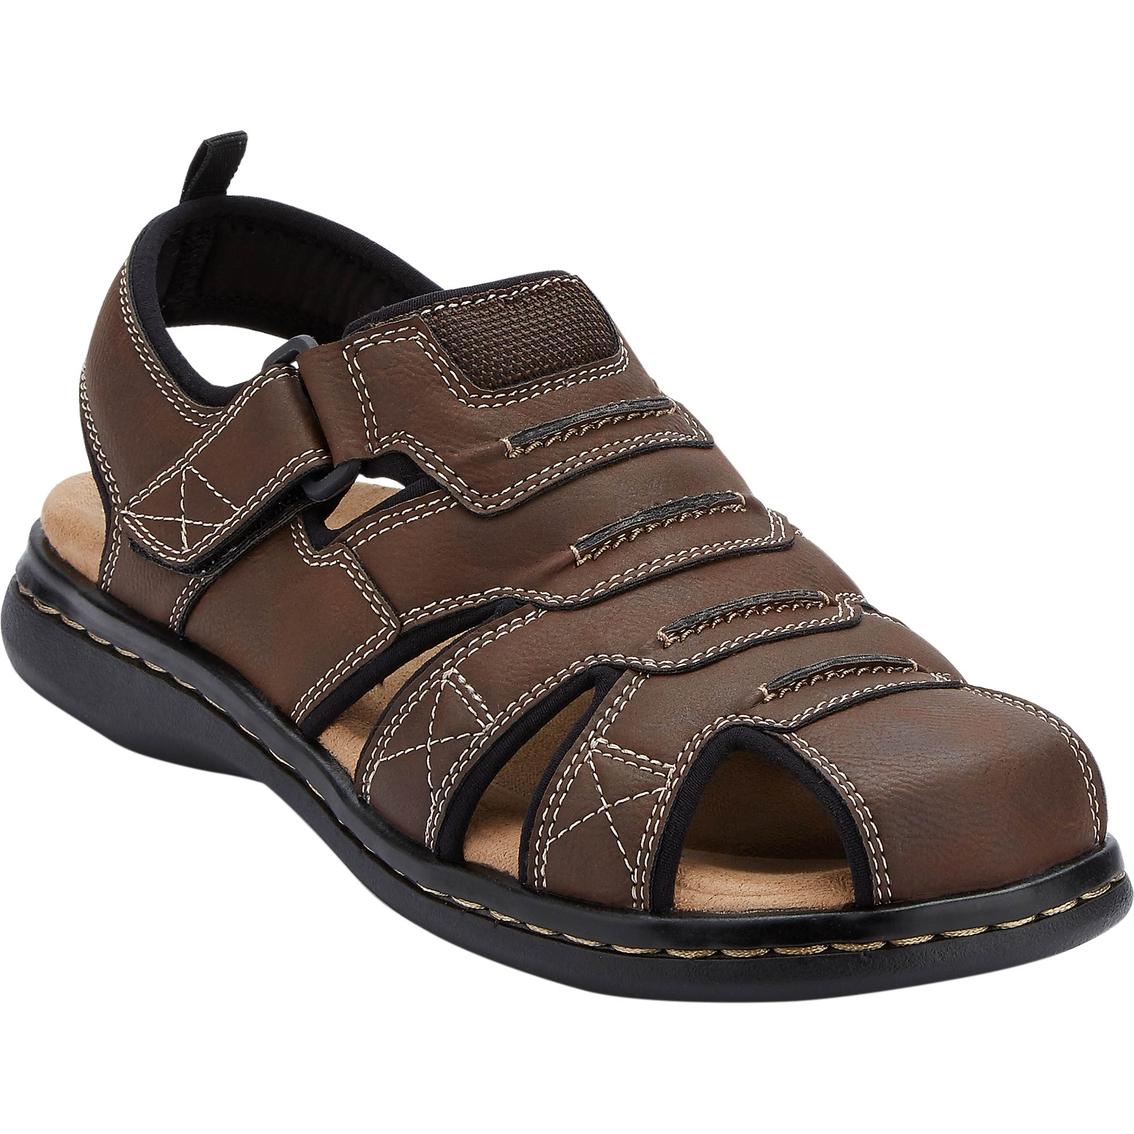 Dockers Searose Sandals Sandals Amp Flip Flops Swim Shop